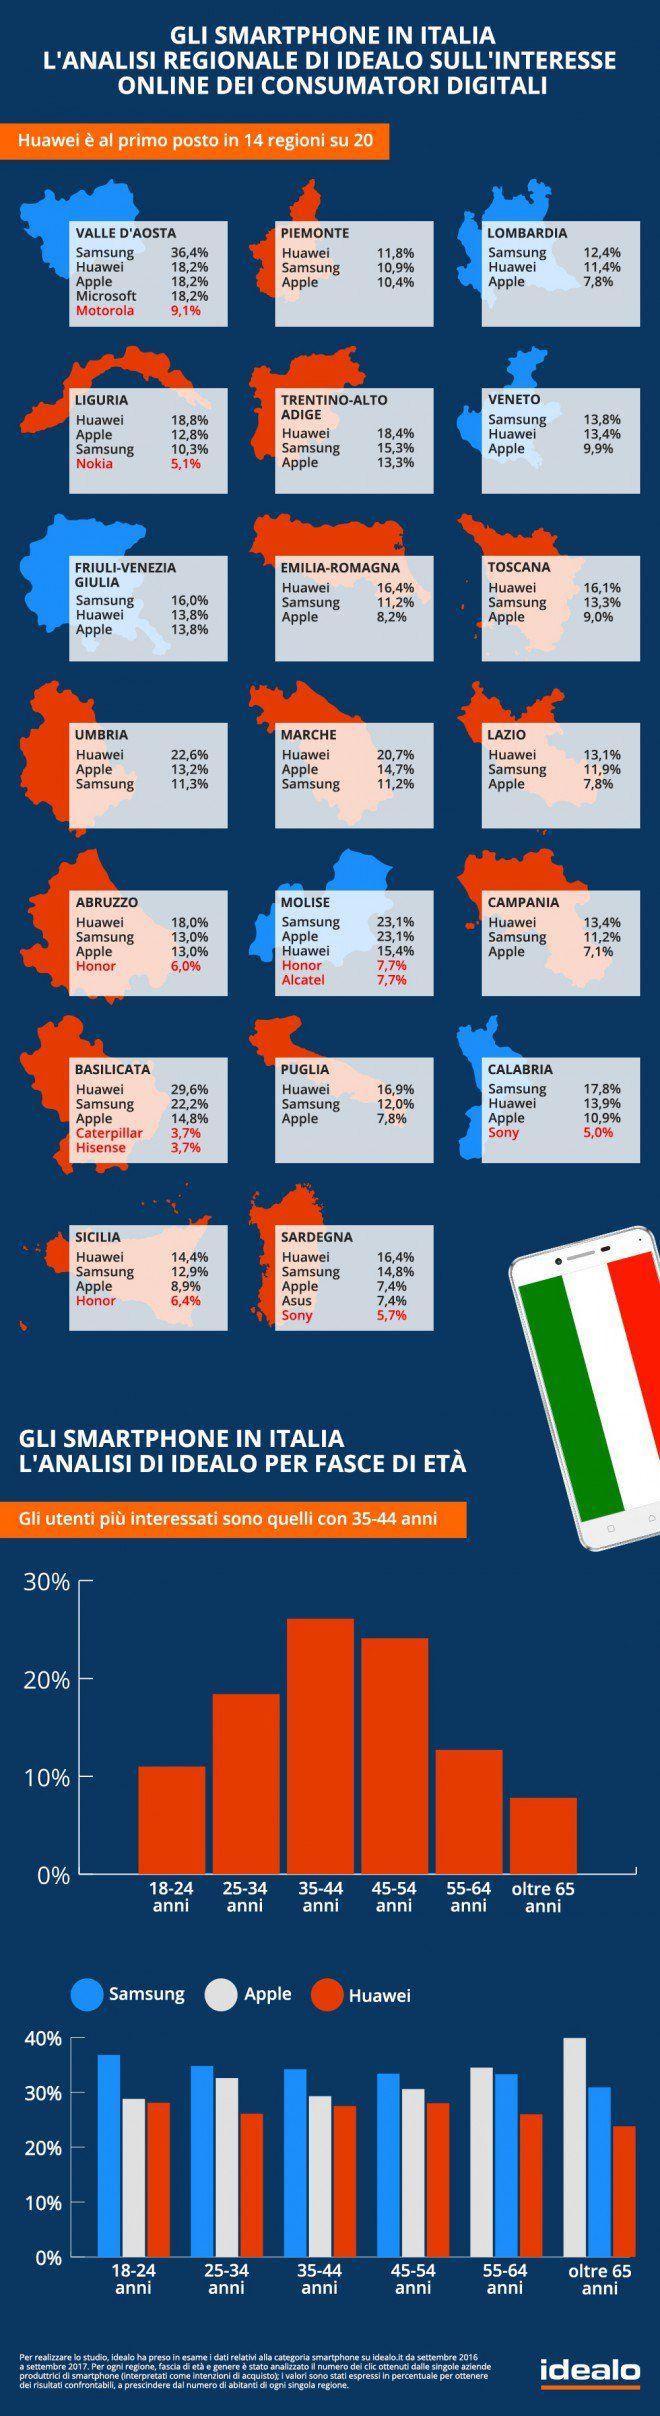 Smartphone in Italia classifica per regioni fasce e produttori